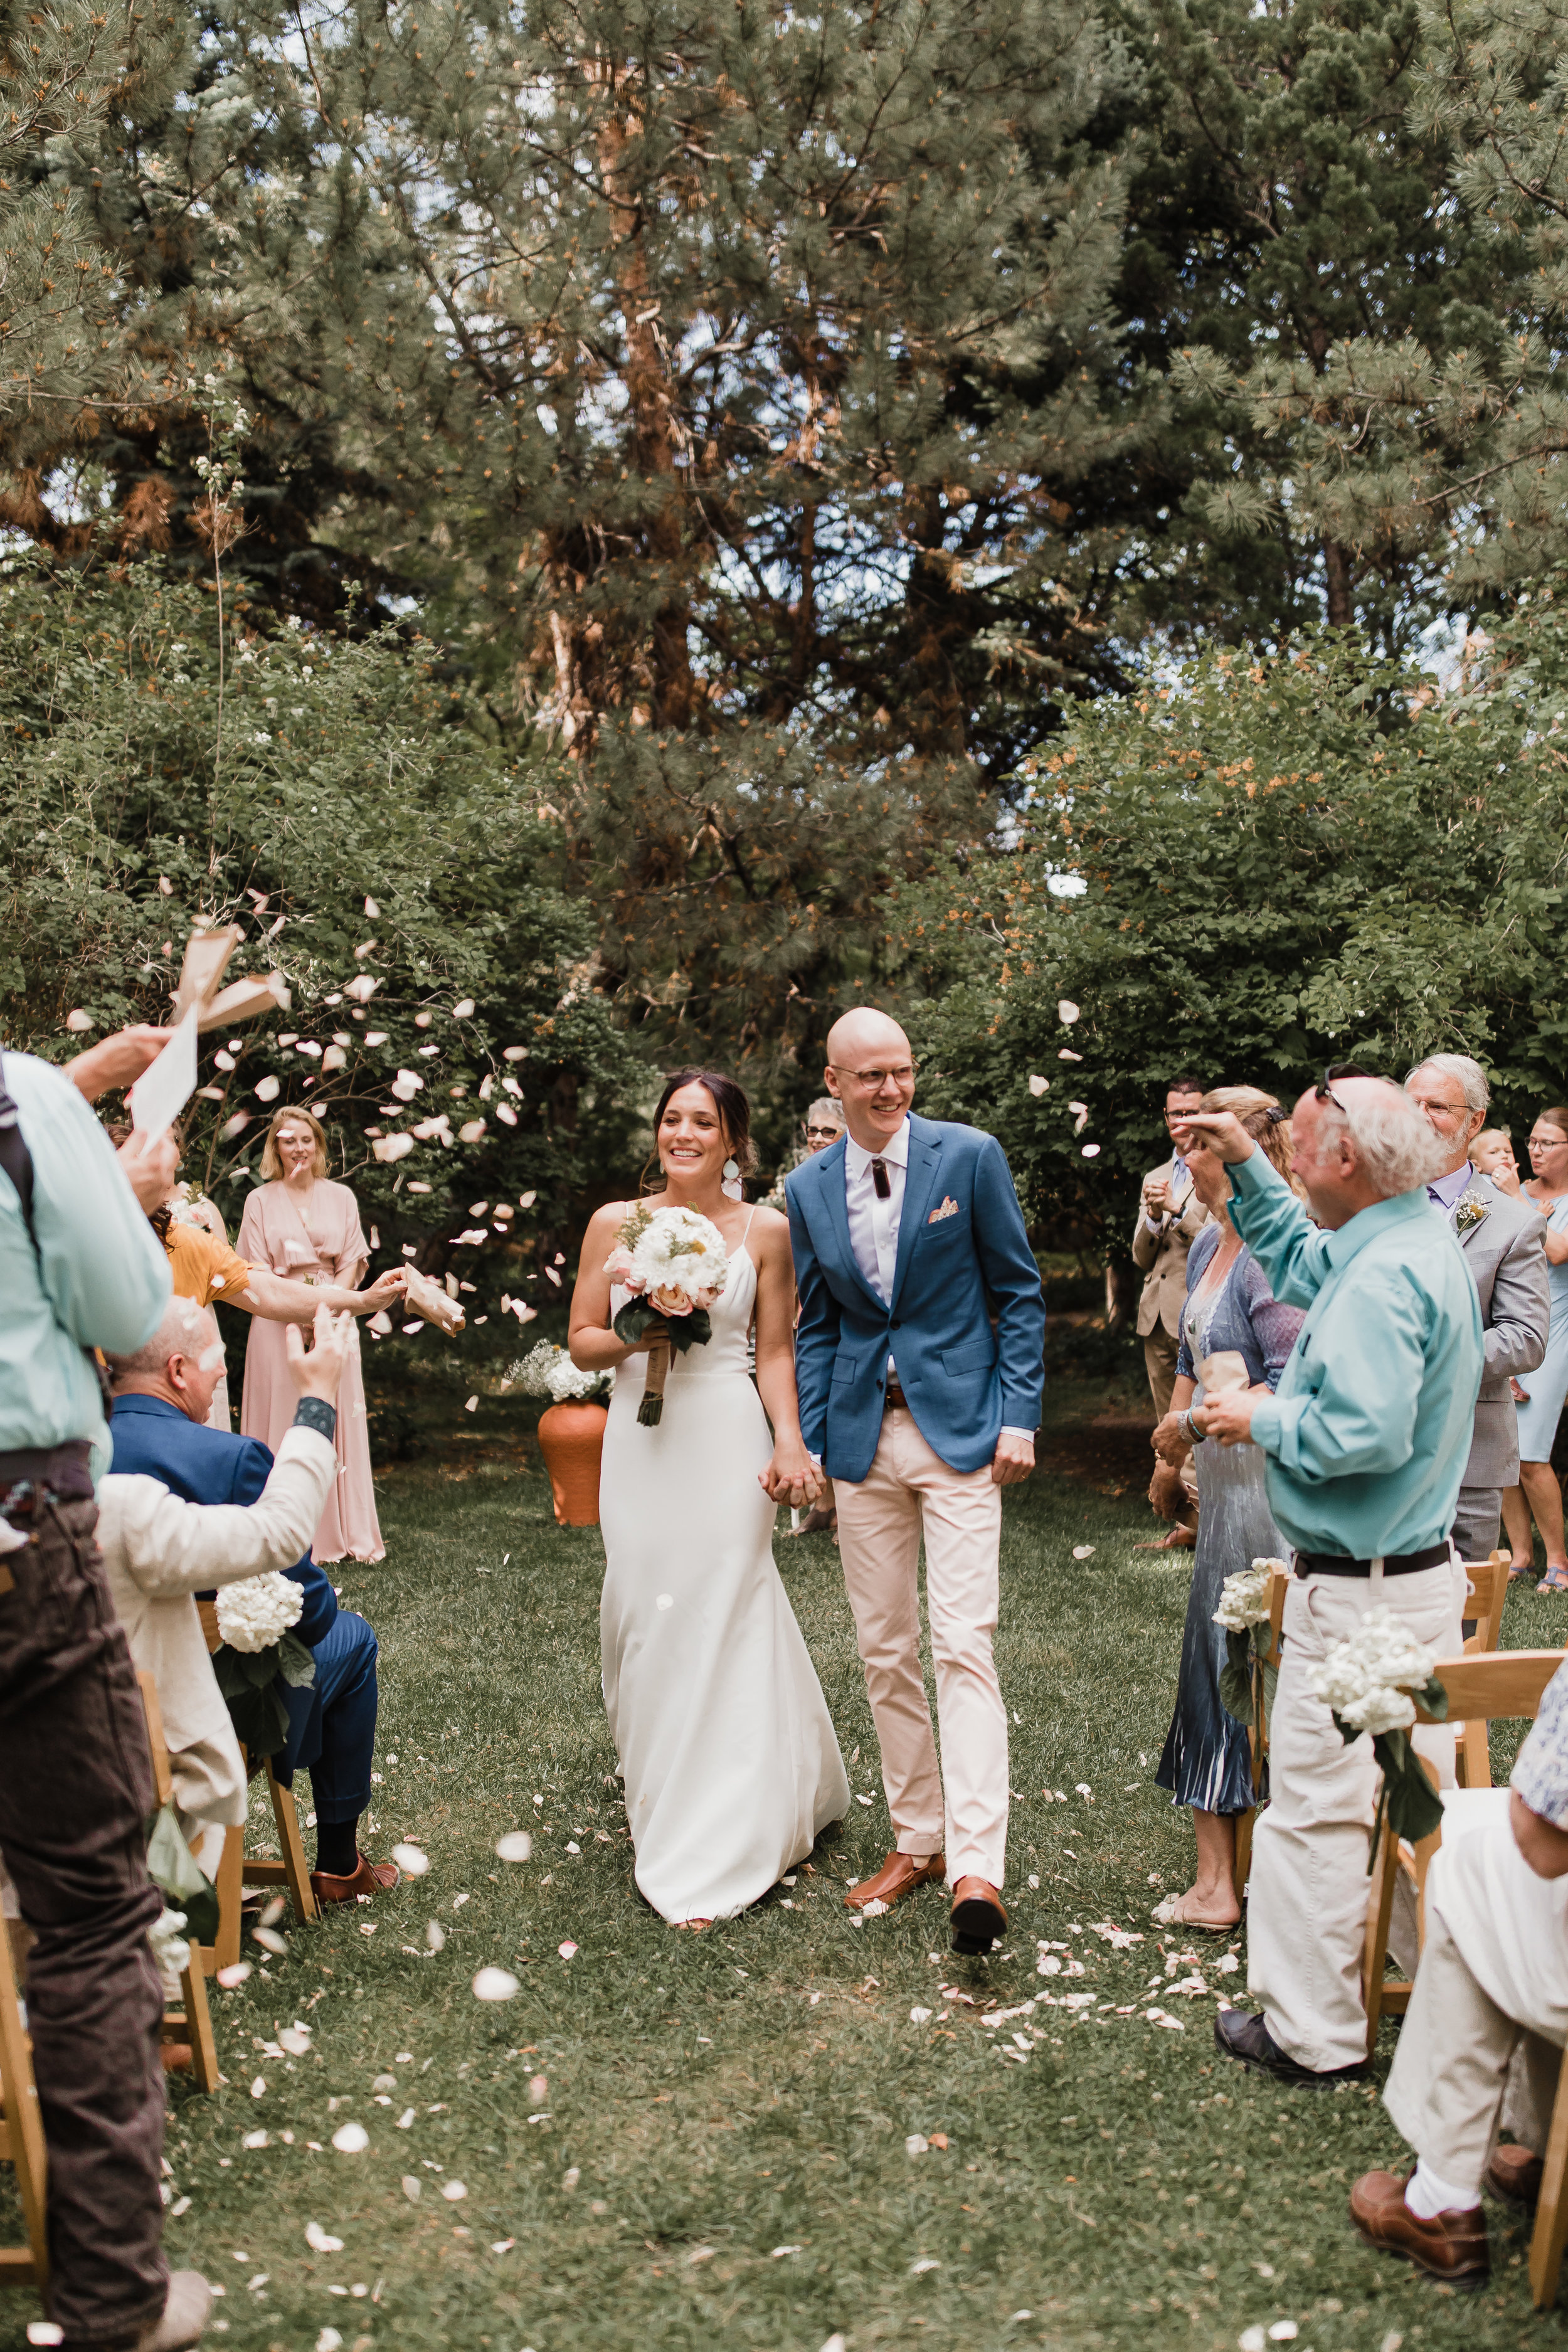 lAVENDER FARM WEDDING ALBUQUERQUE NEW MEXICO ALICIA LUCIA PHOTOGRAPHY GUESTS THROWING PETALS AS COUPLE LEAVES WEDDING CEREMONY